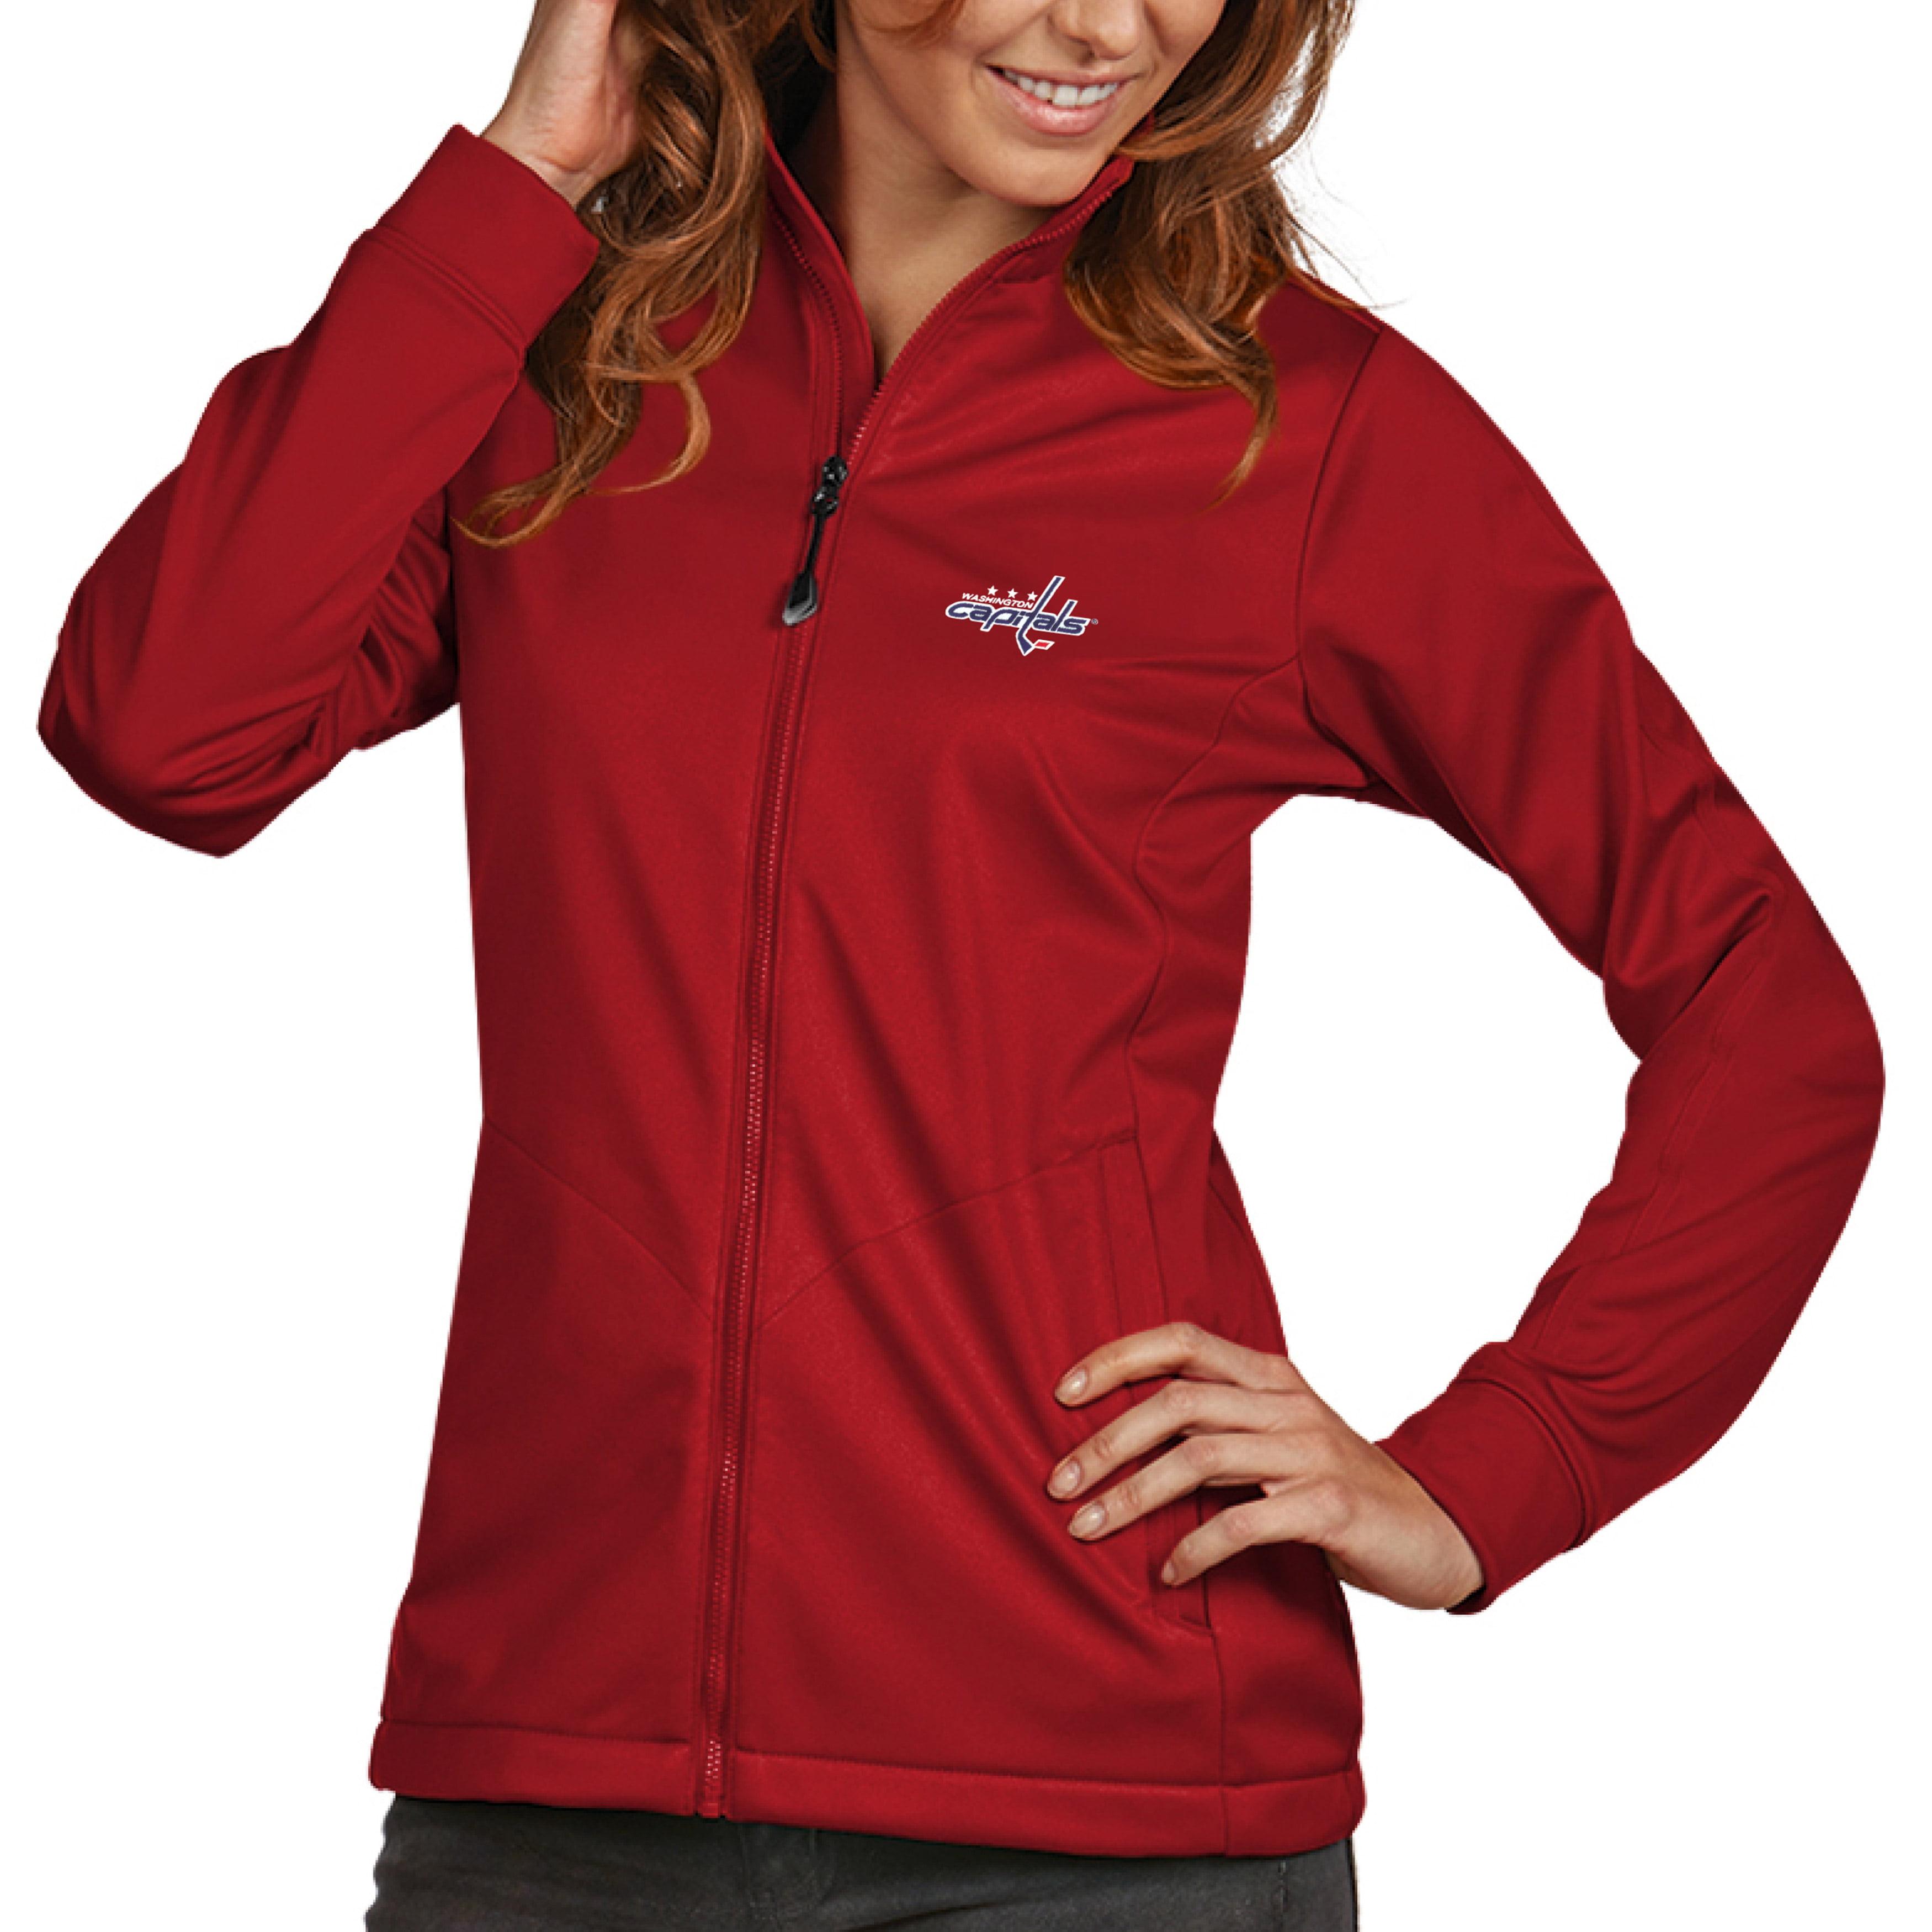 Washington Capitals Antigua Women's Golf Full Zip Jacket Red by ANTIGUA GROUP/ 22534